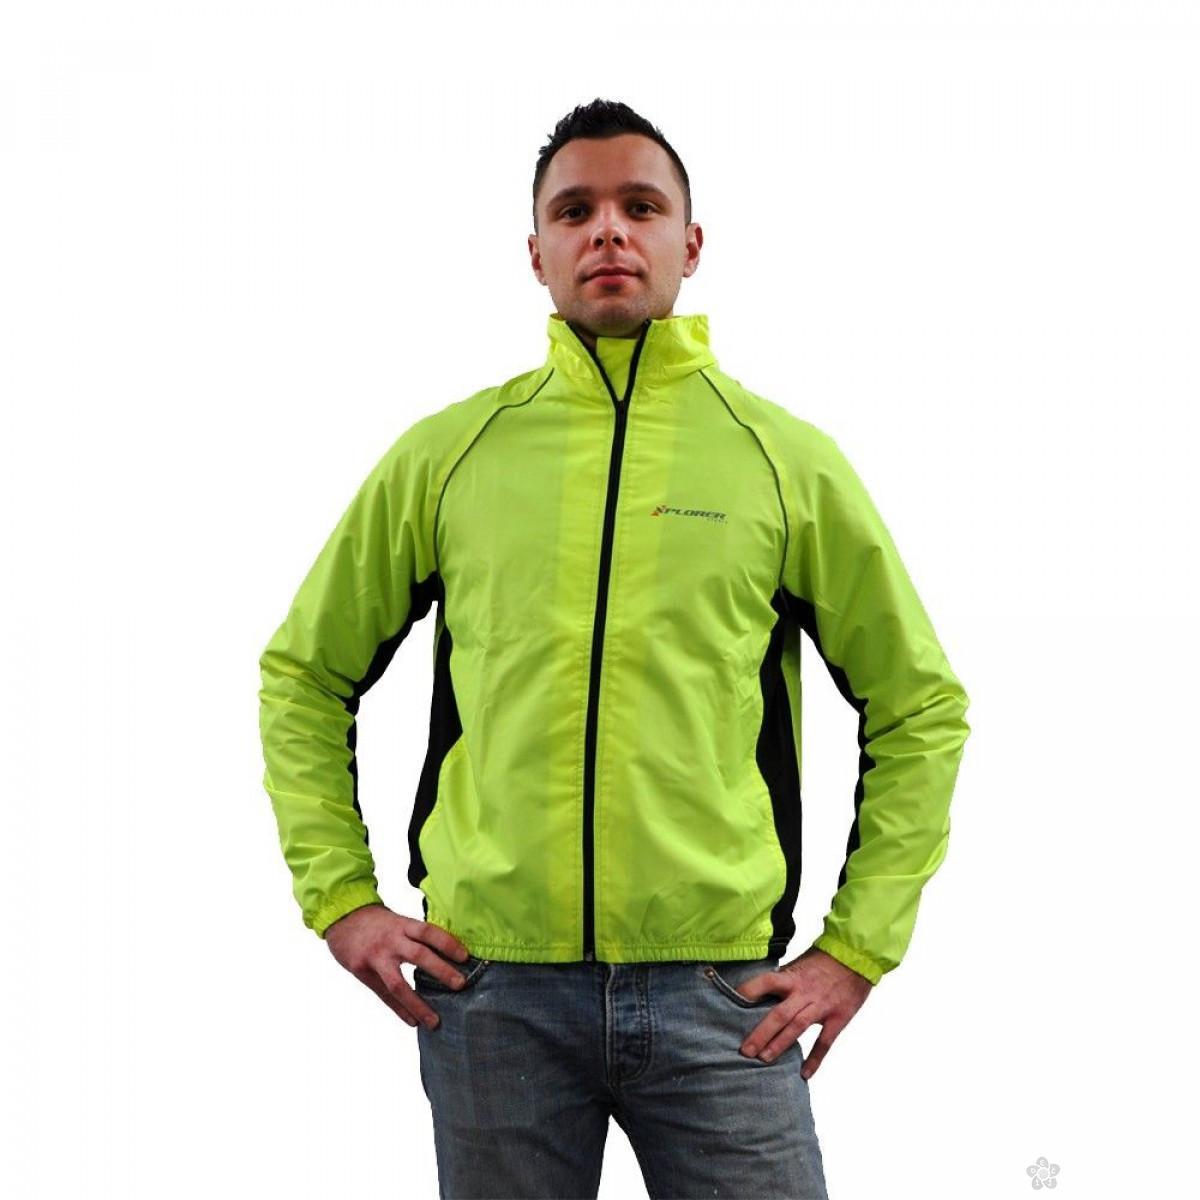 Biciklistička jakna Xplorer Scirocco vel. M